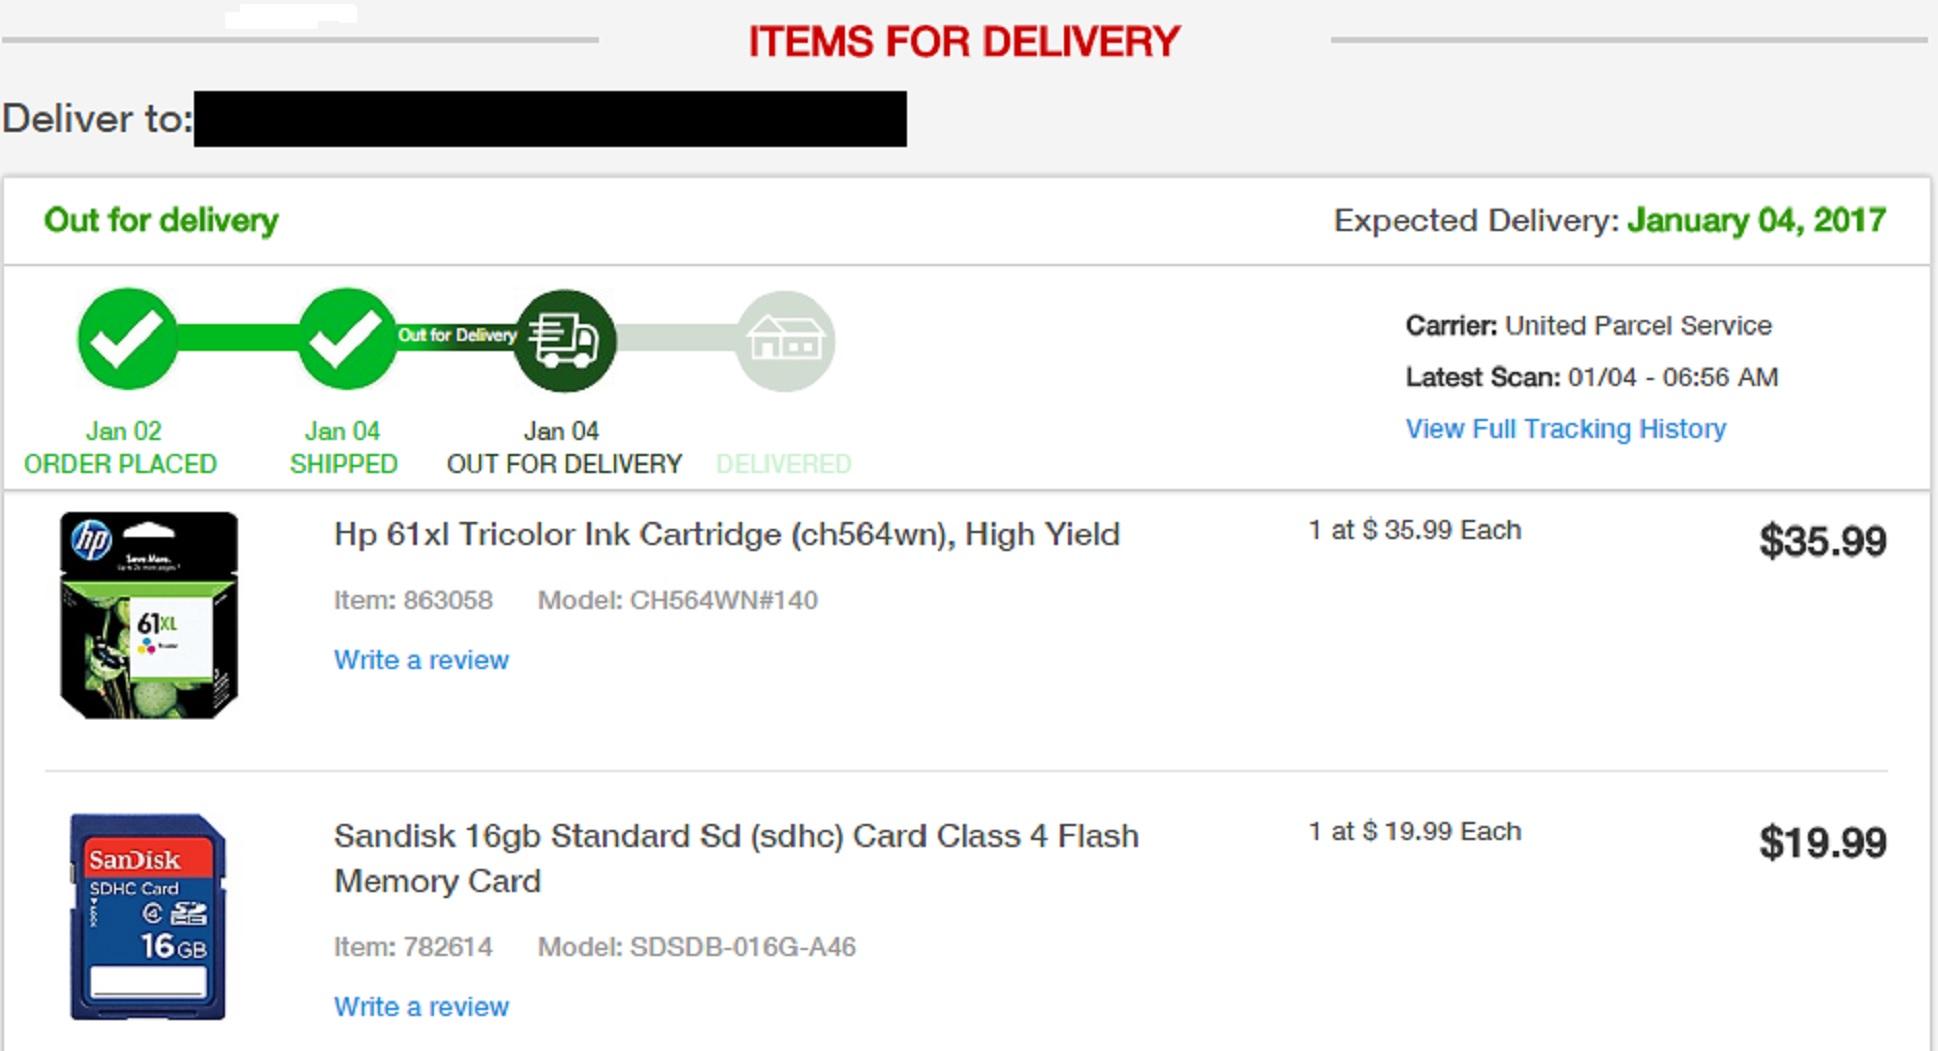 Screencap I took of my Staples order